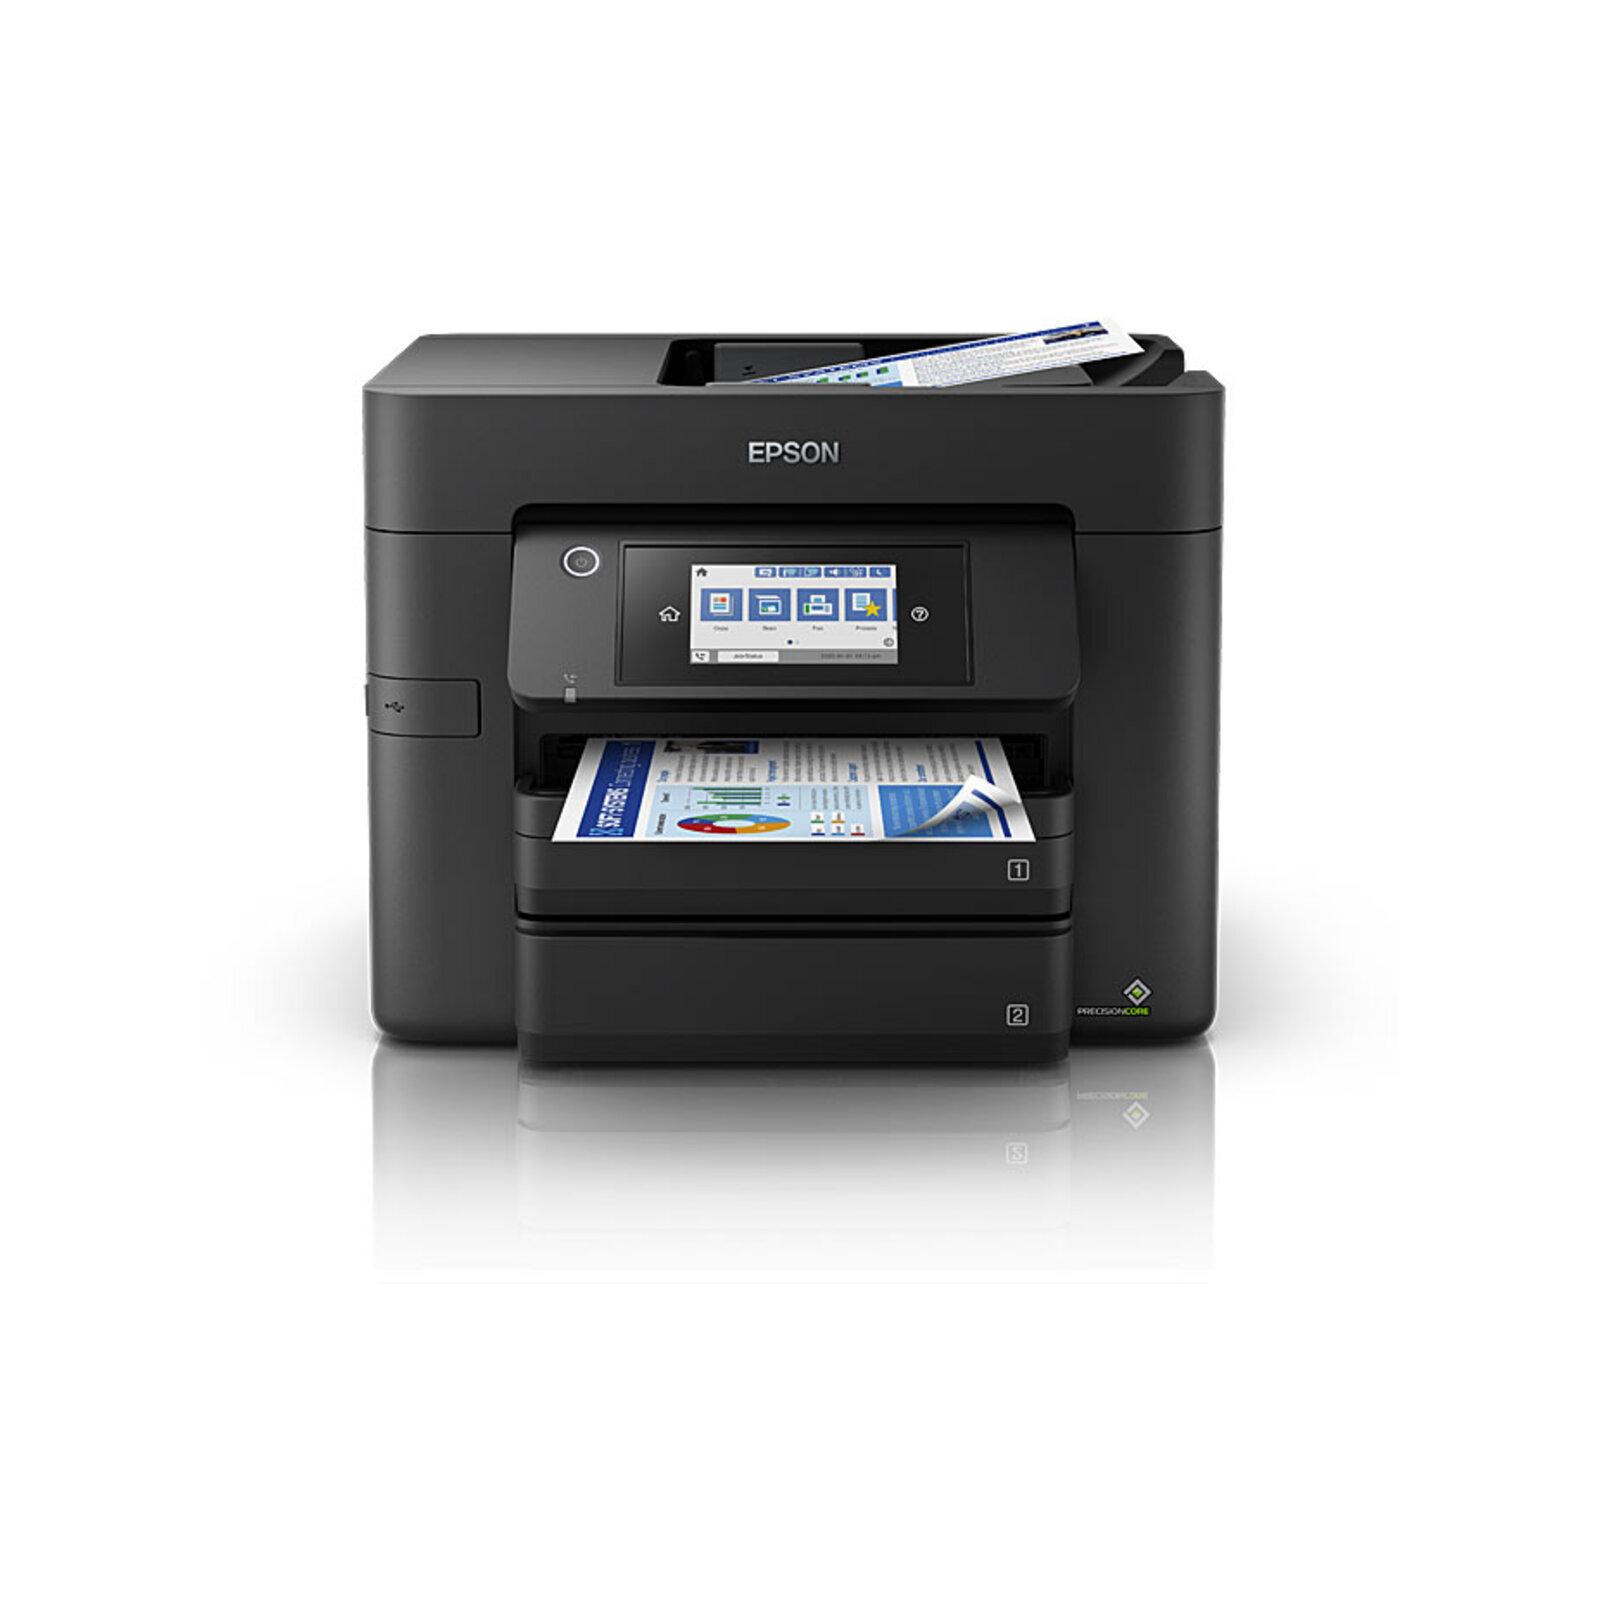 Epson WorkForce Pro WF-4835 Inkjet MFP - Print, Copy, Scan, Fax, Ethernet, Wi-Fi Direct